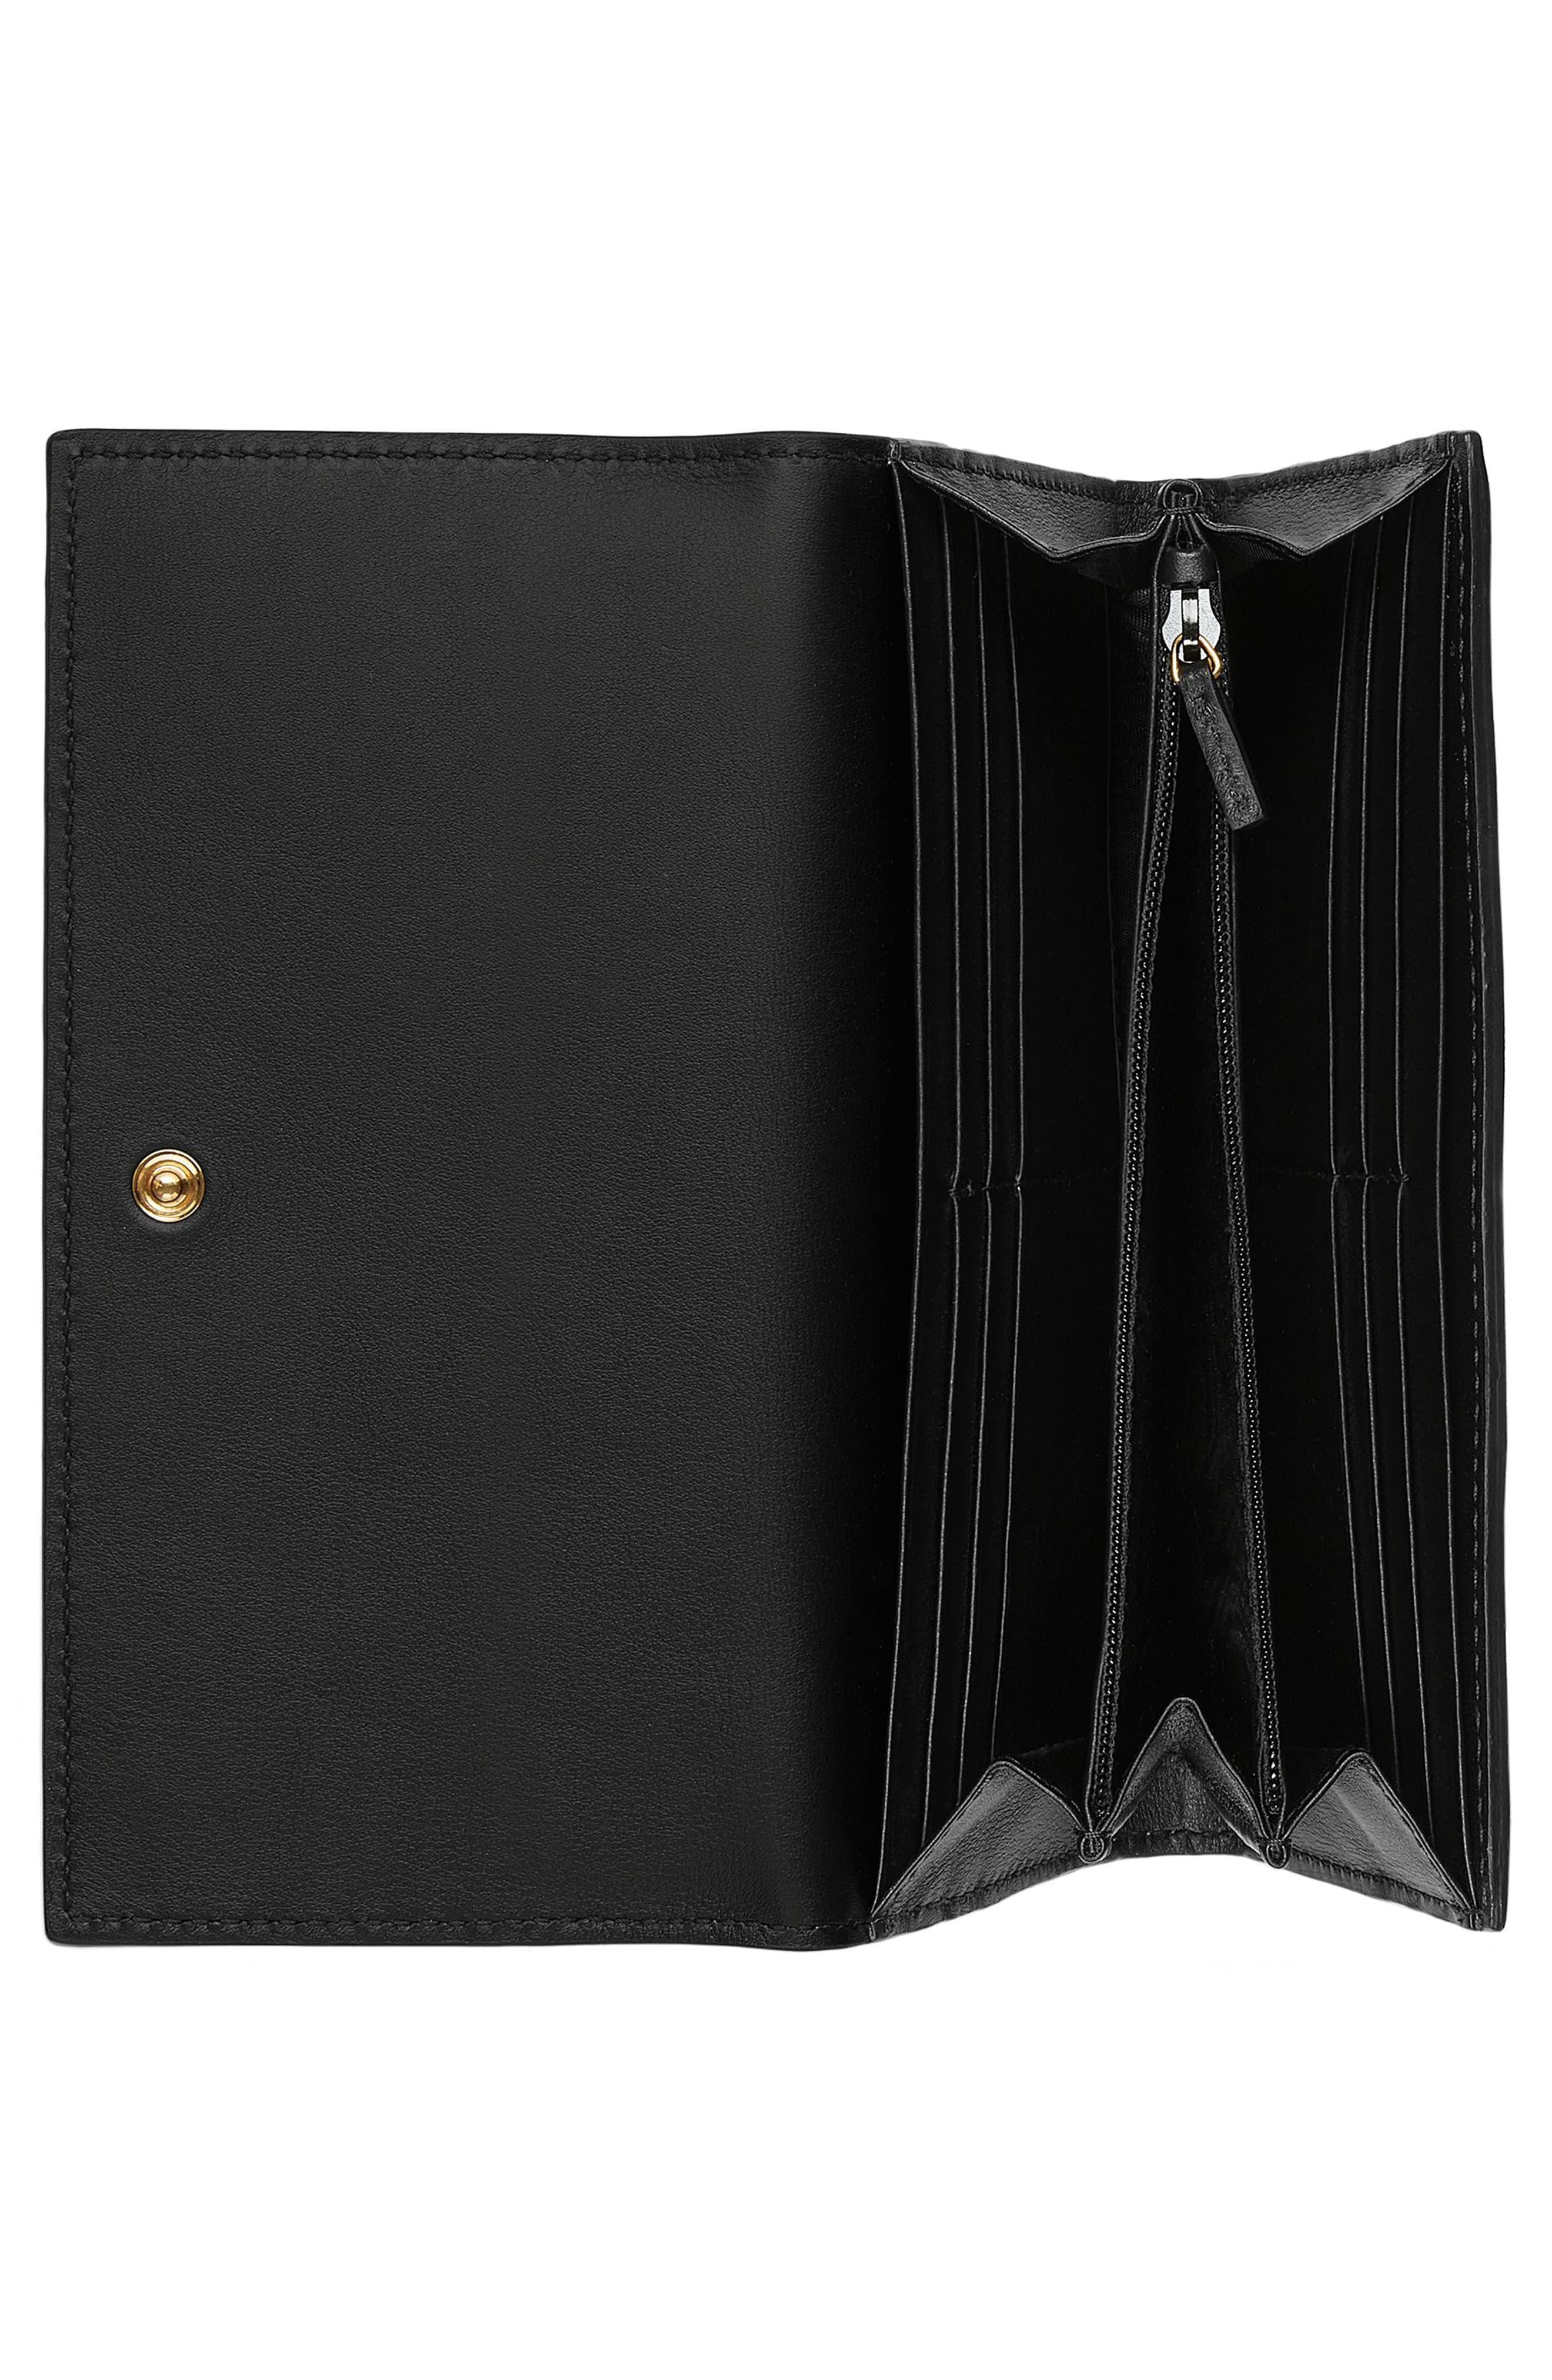 d5d98e839707 Gucci - Natural Linea Bee Gg Supreme Continental Wallet - Lyst. View  fullscreen